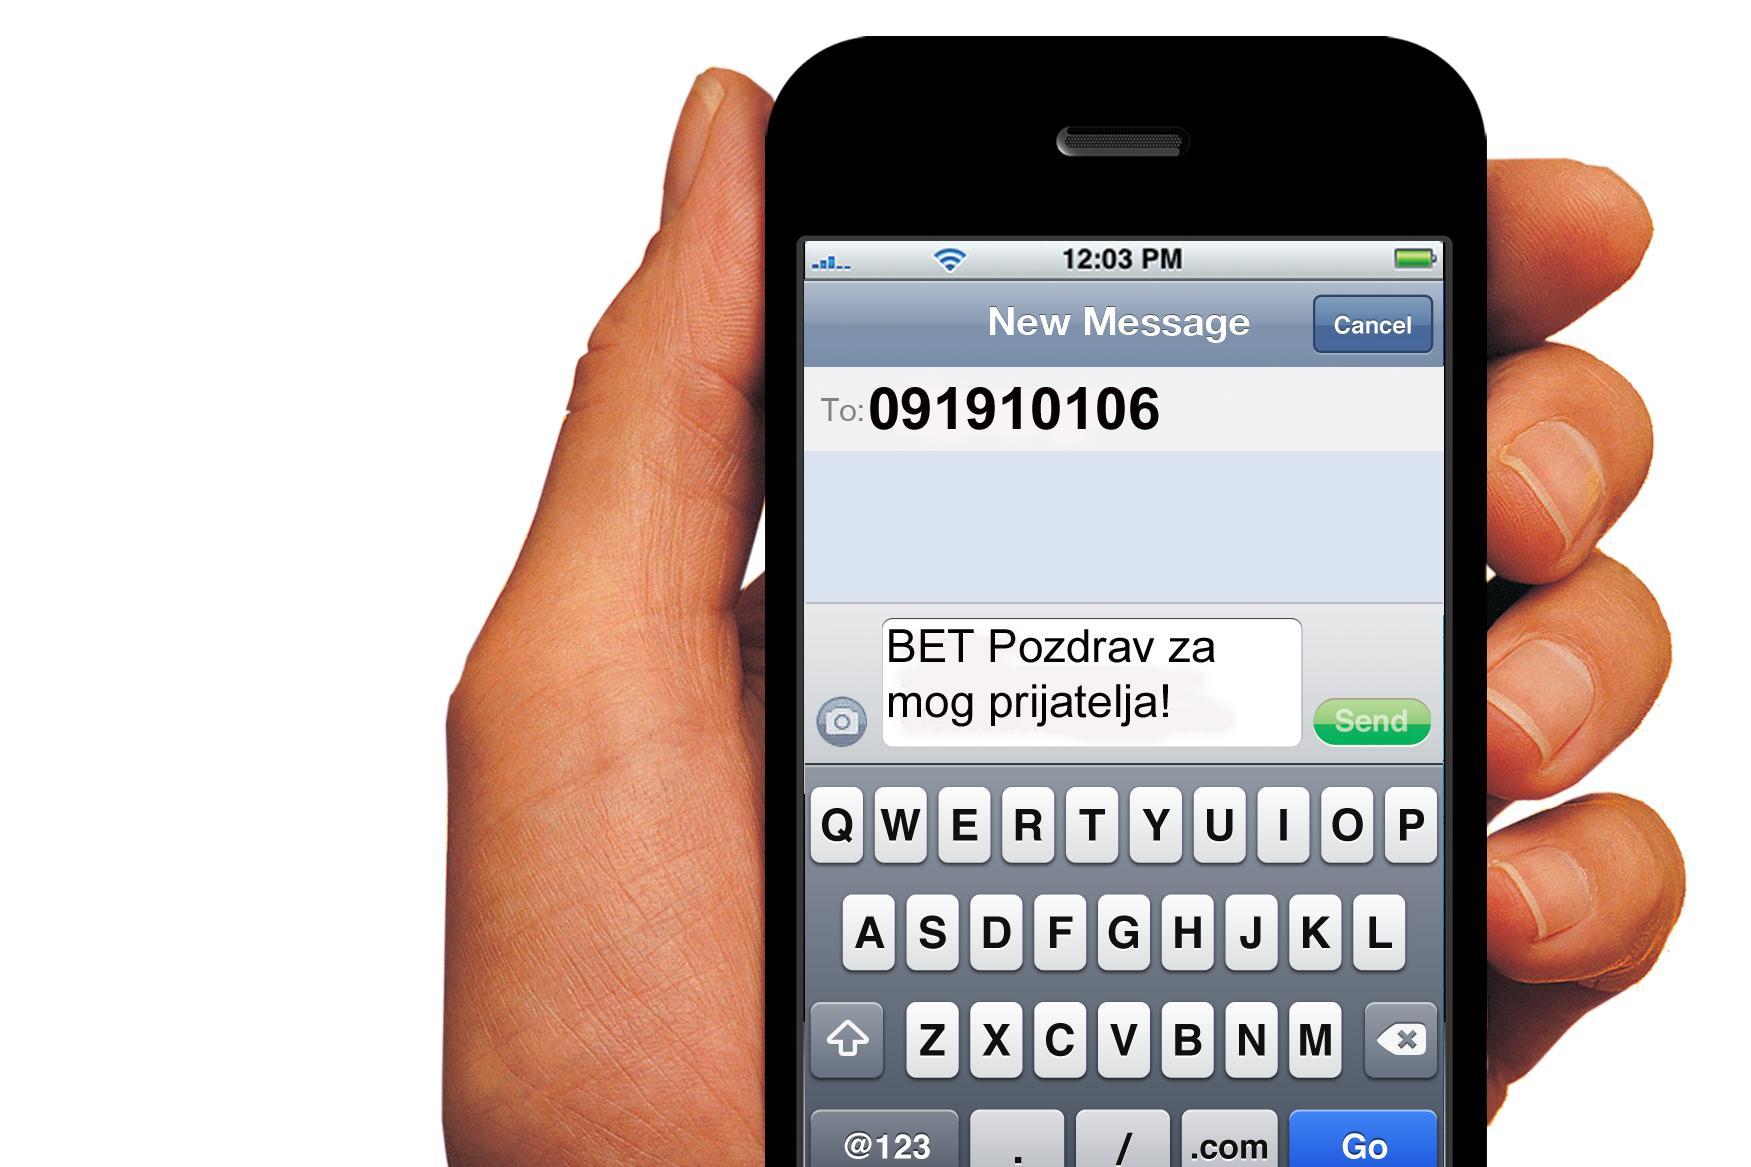 bet-sms